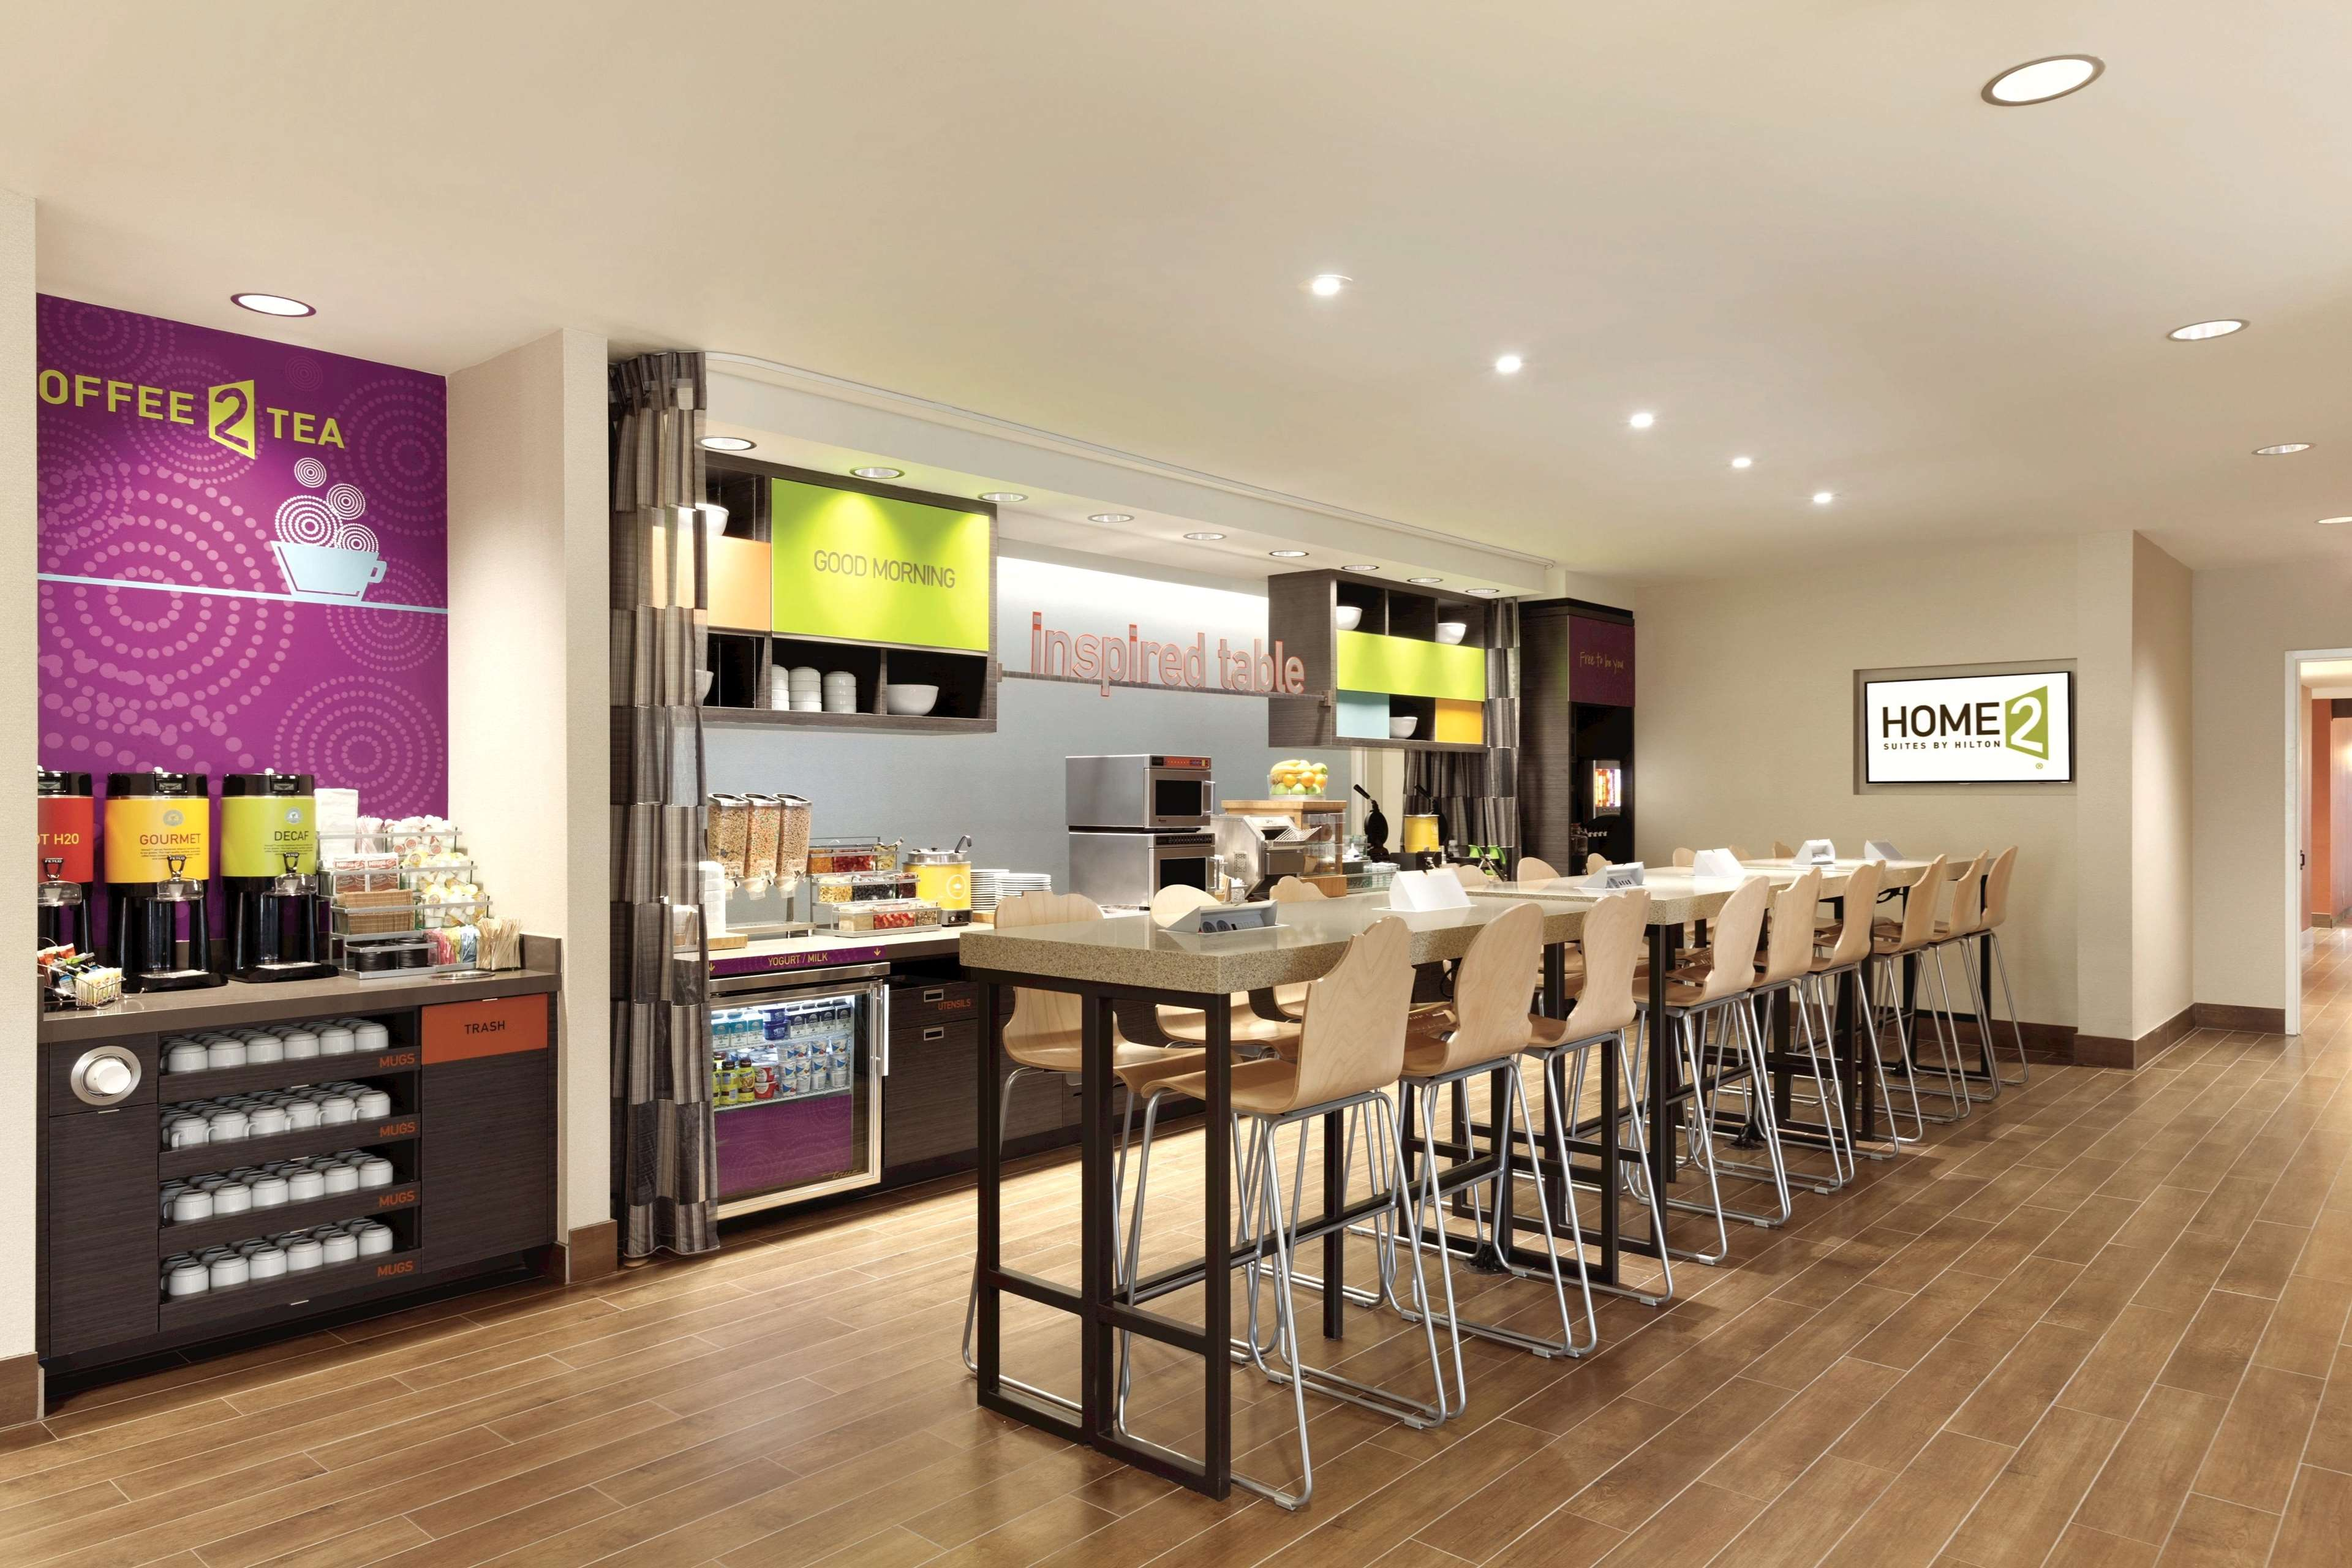 Home2 Suites by Hilton Austin Round Rock image 20